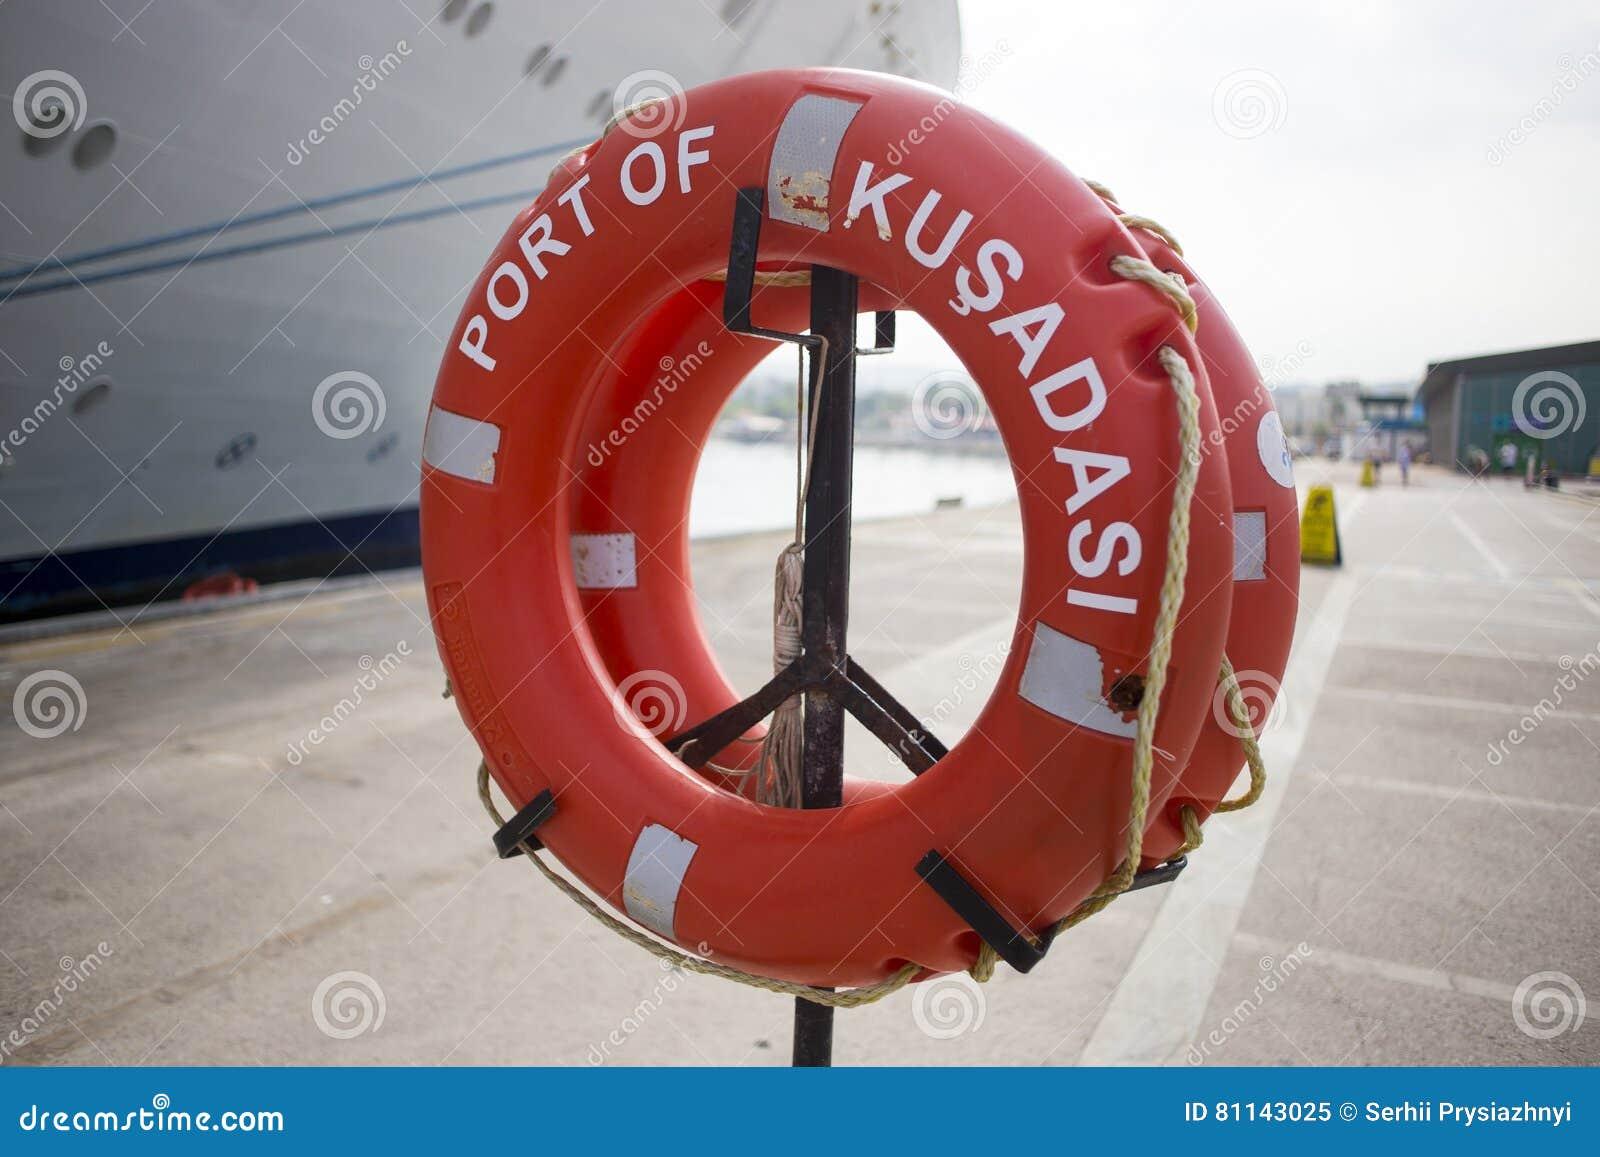 Séjour orange de bouée de sauvetage dans le port Kusadasi